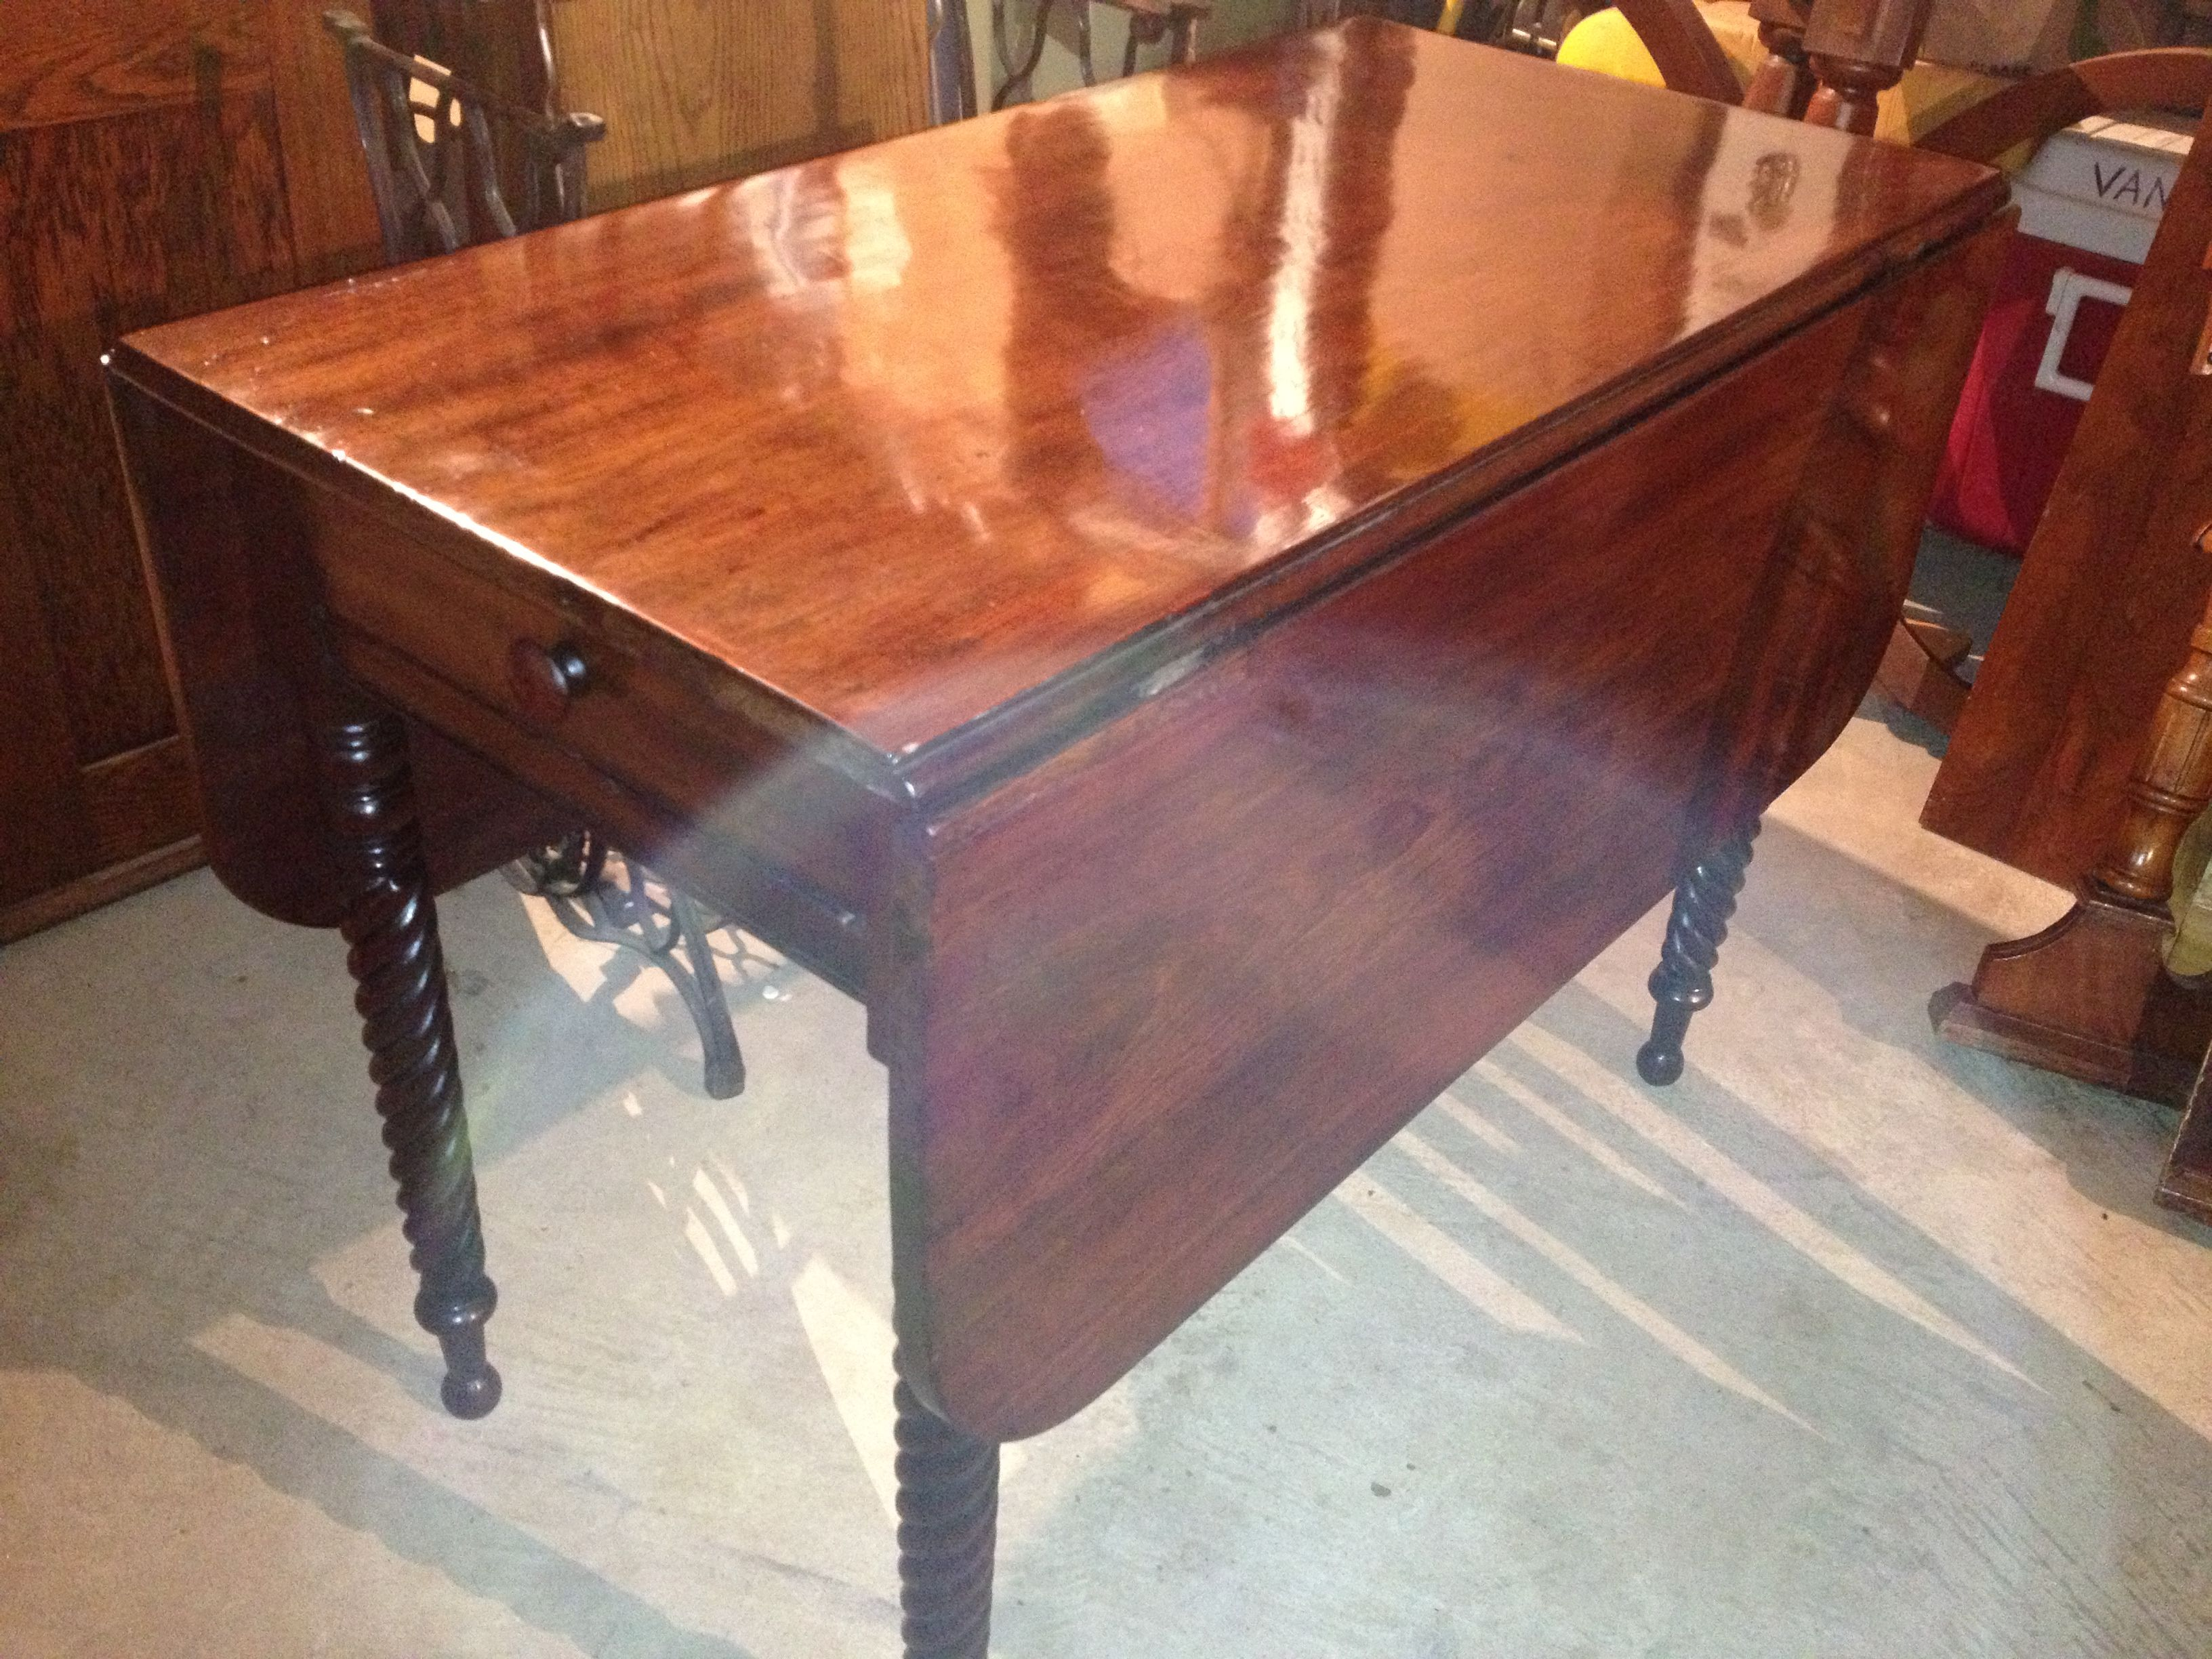 Pre Civil War Mid 1800s Or Earlier Burl Walnut Drop Leaf Table After Restoration